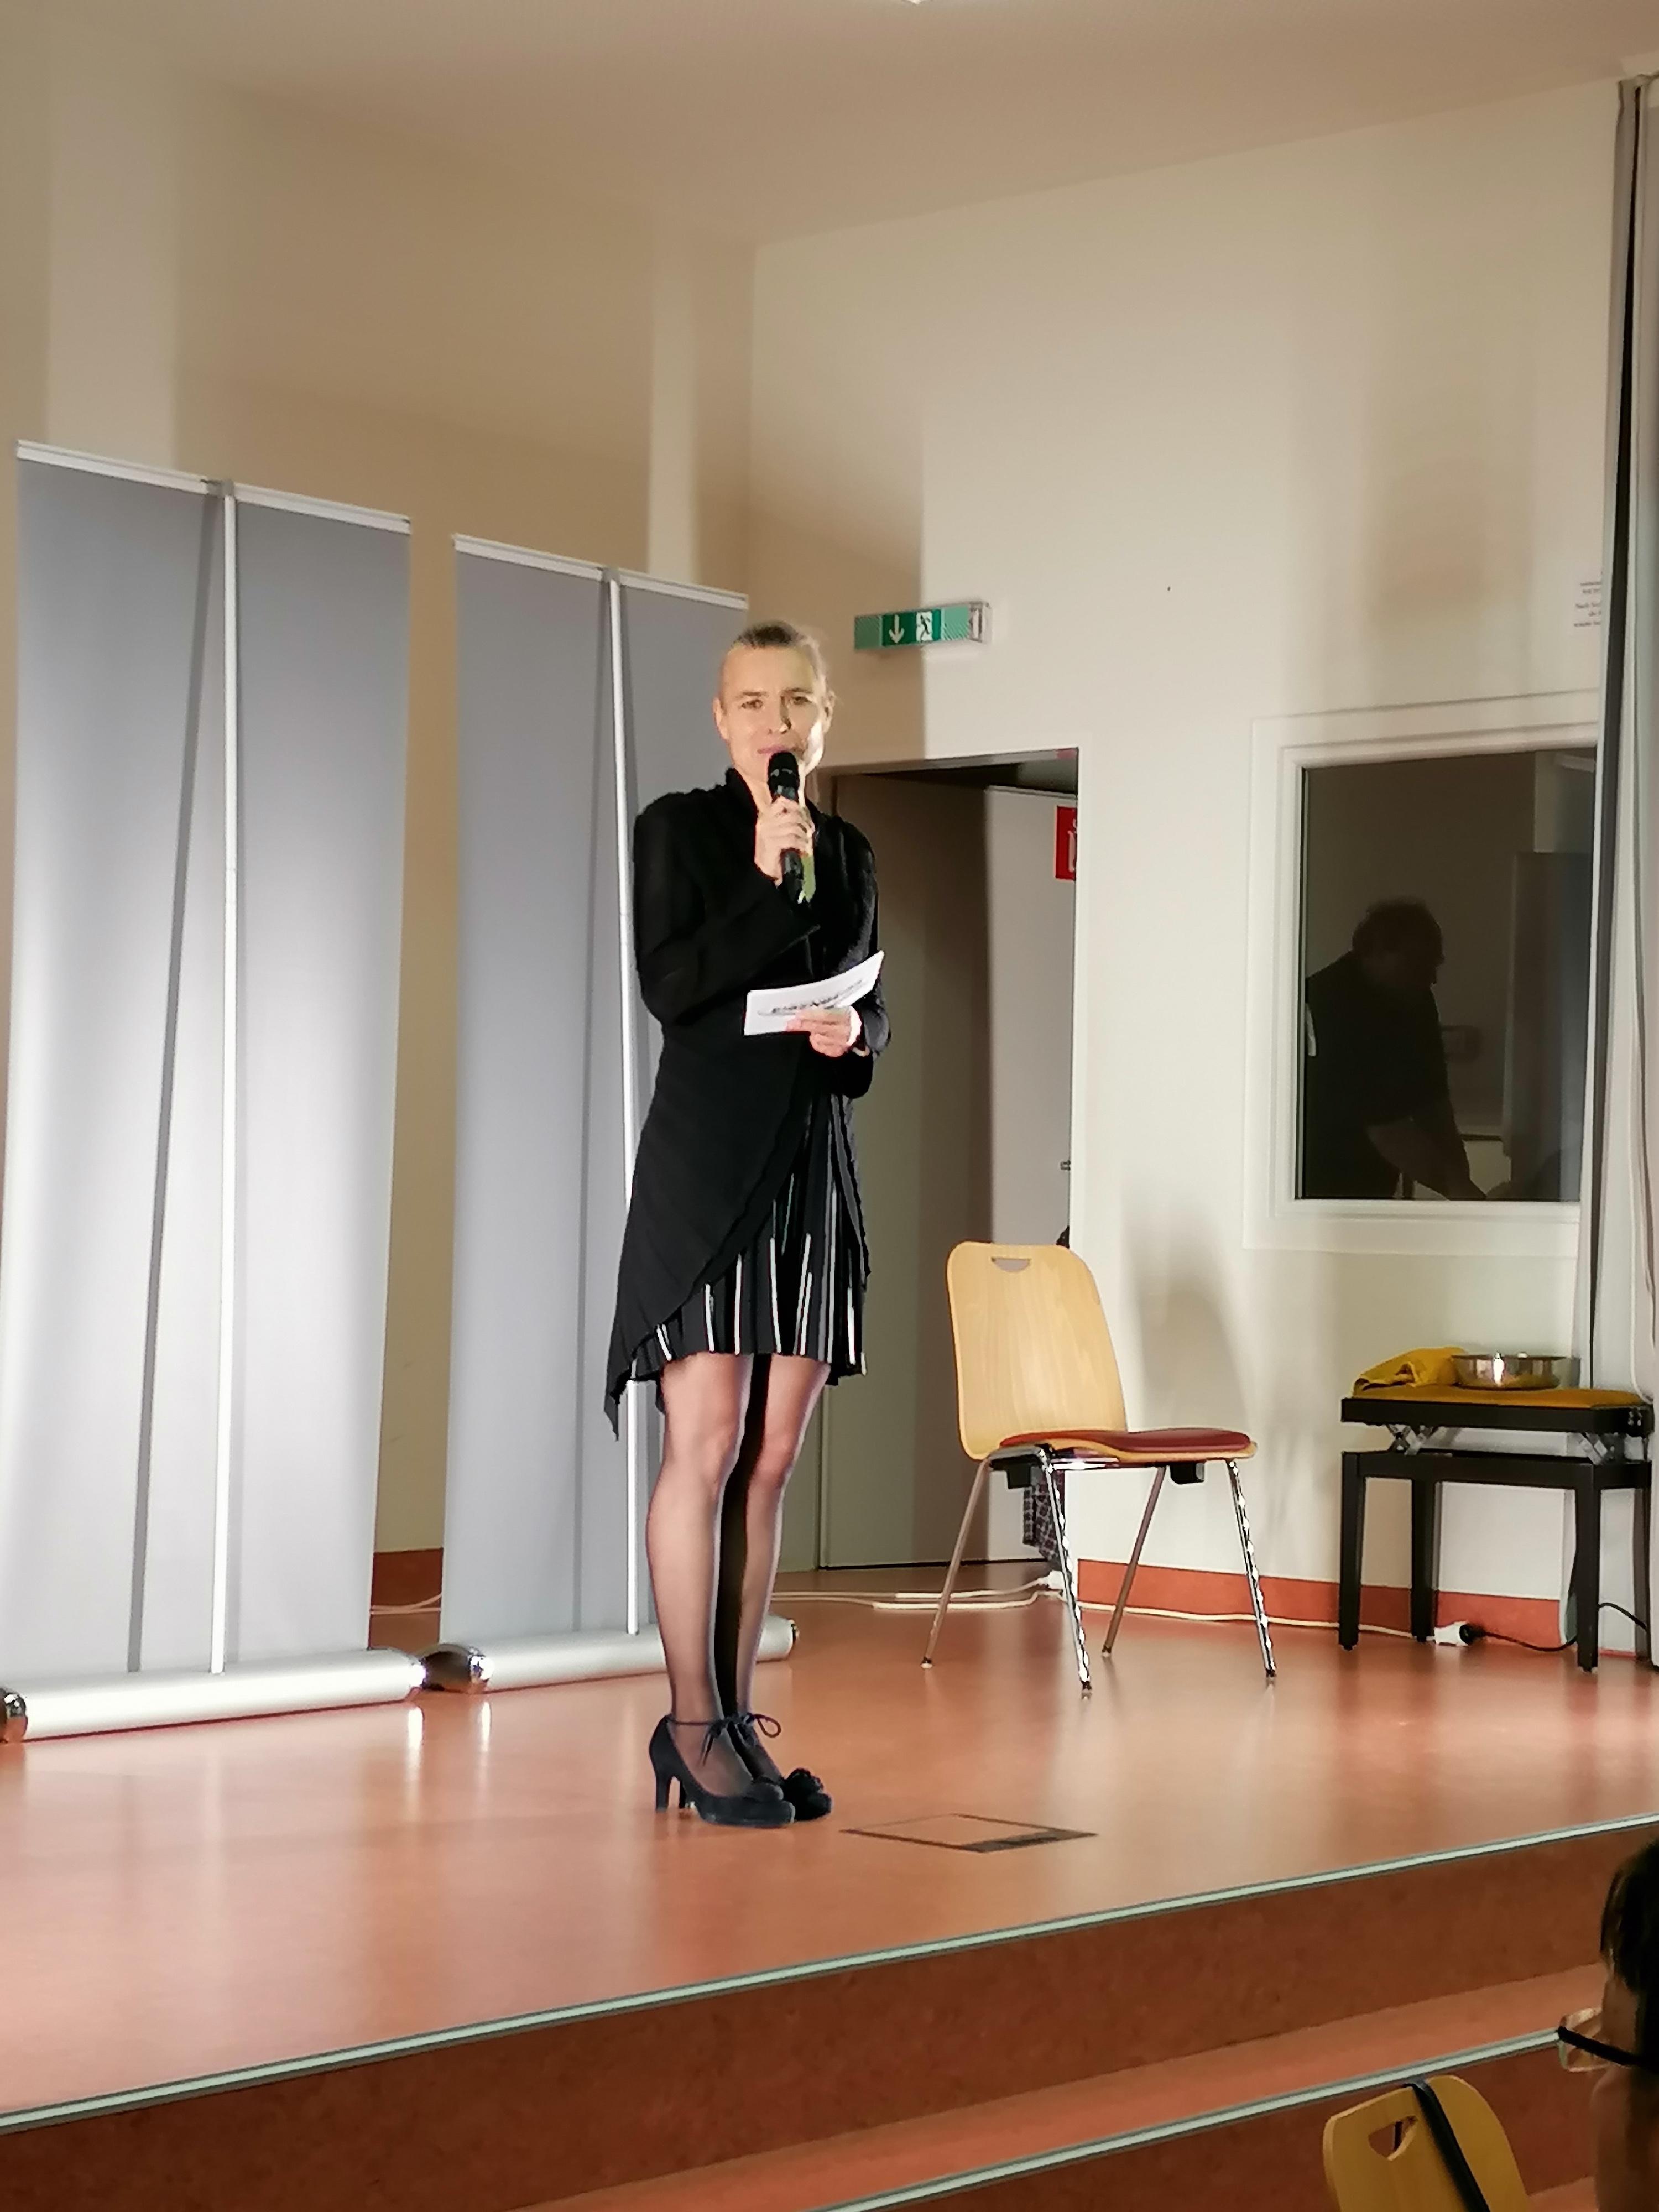 Dating seite aus enns - volunteeralert.com / 2020 / Absam frau single